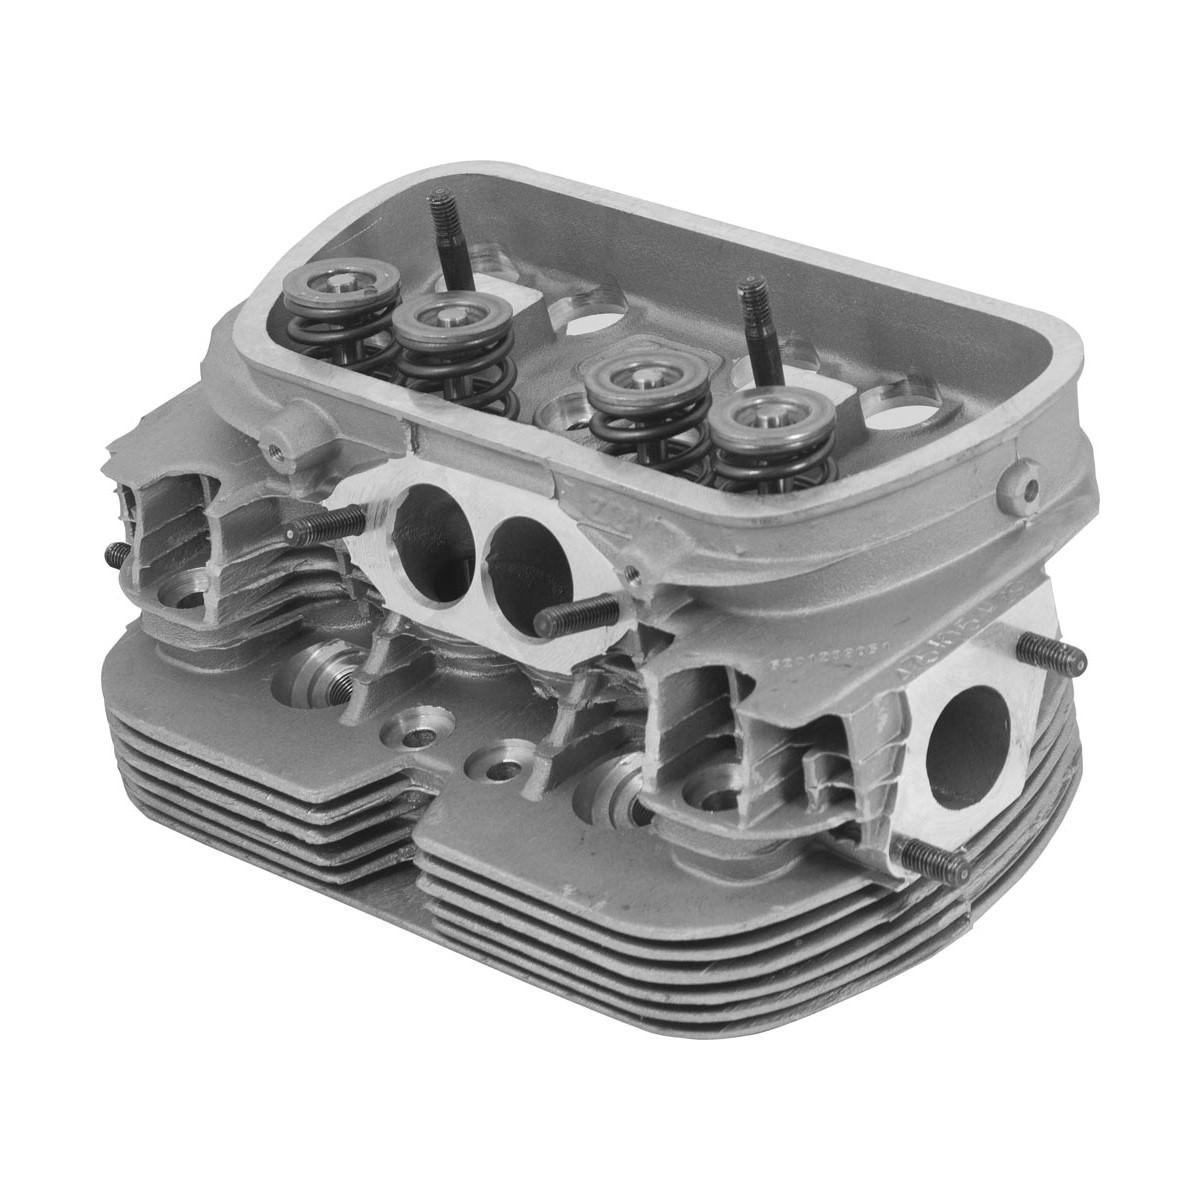 Cabeçote motor Gol BX 1600 81 a 86 - 6 Aletas Tork Moderno